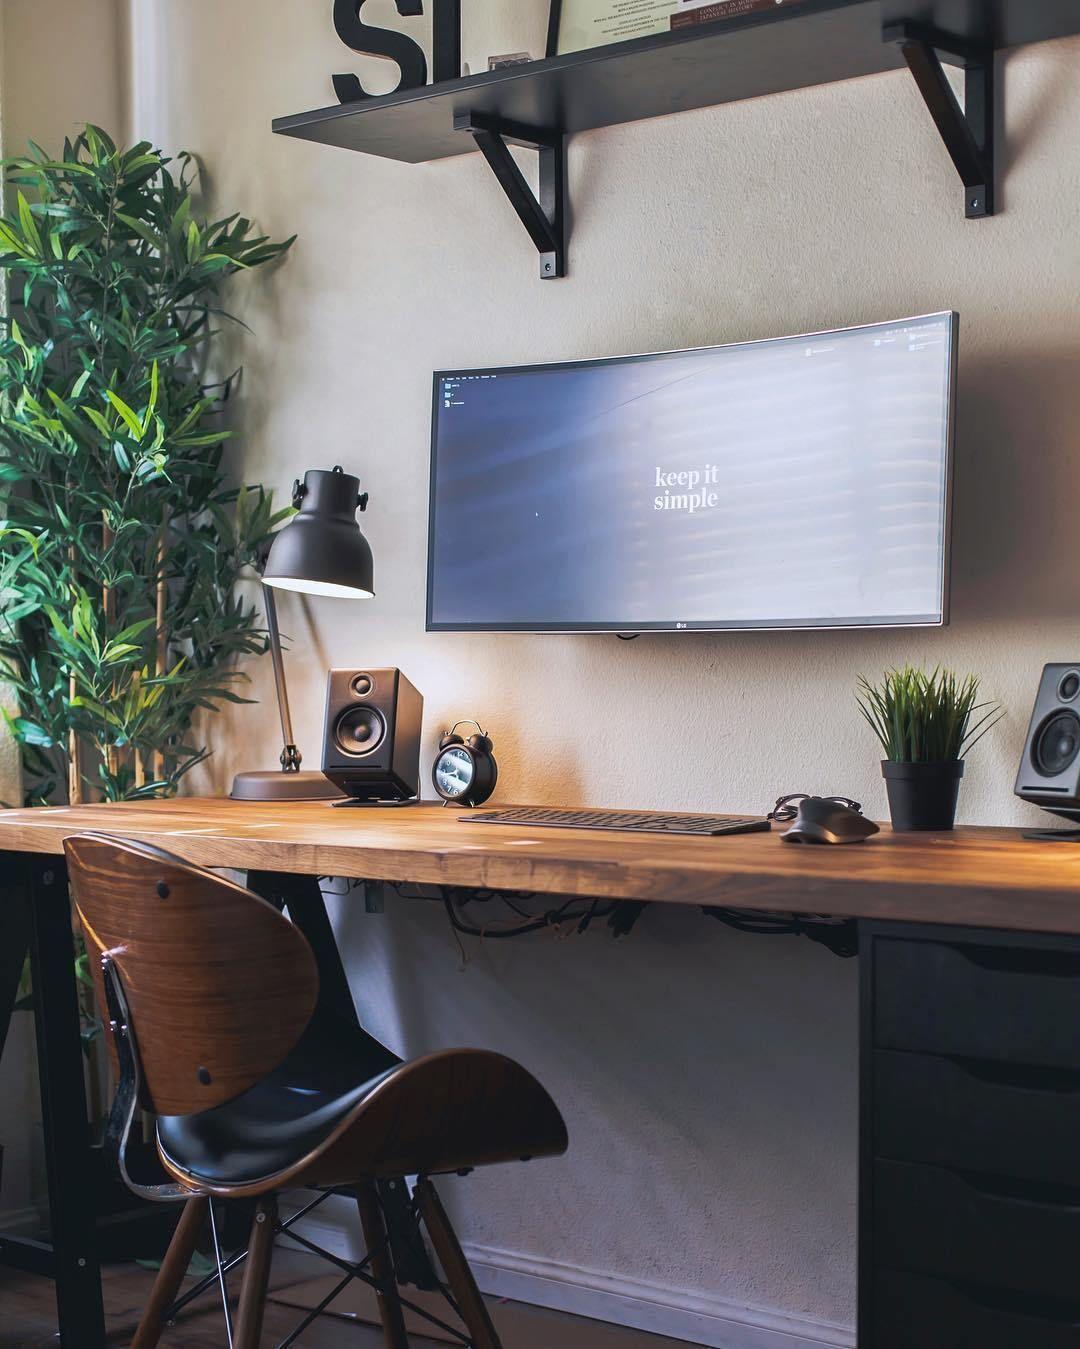 Interior Design Homeoffice: Minimal Setups LG Ultrawide Workspace With Docked